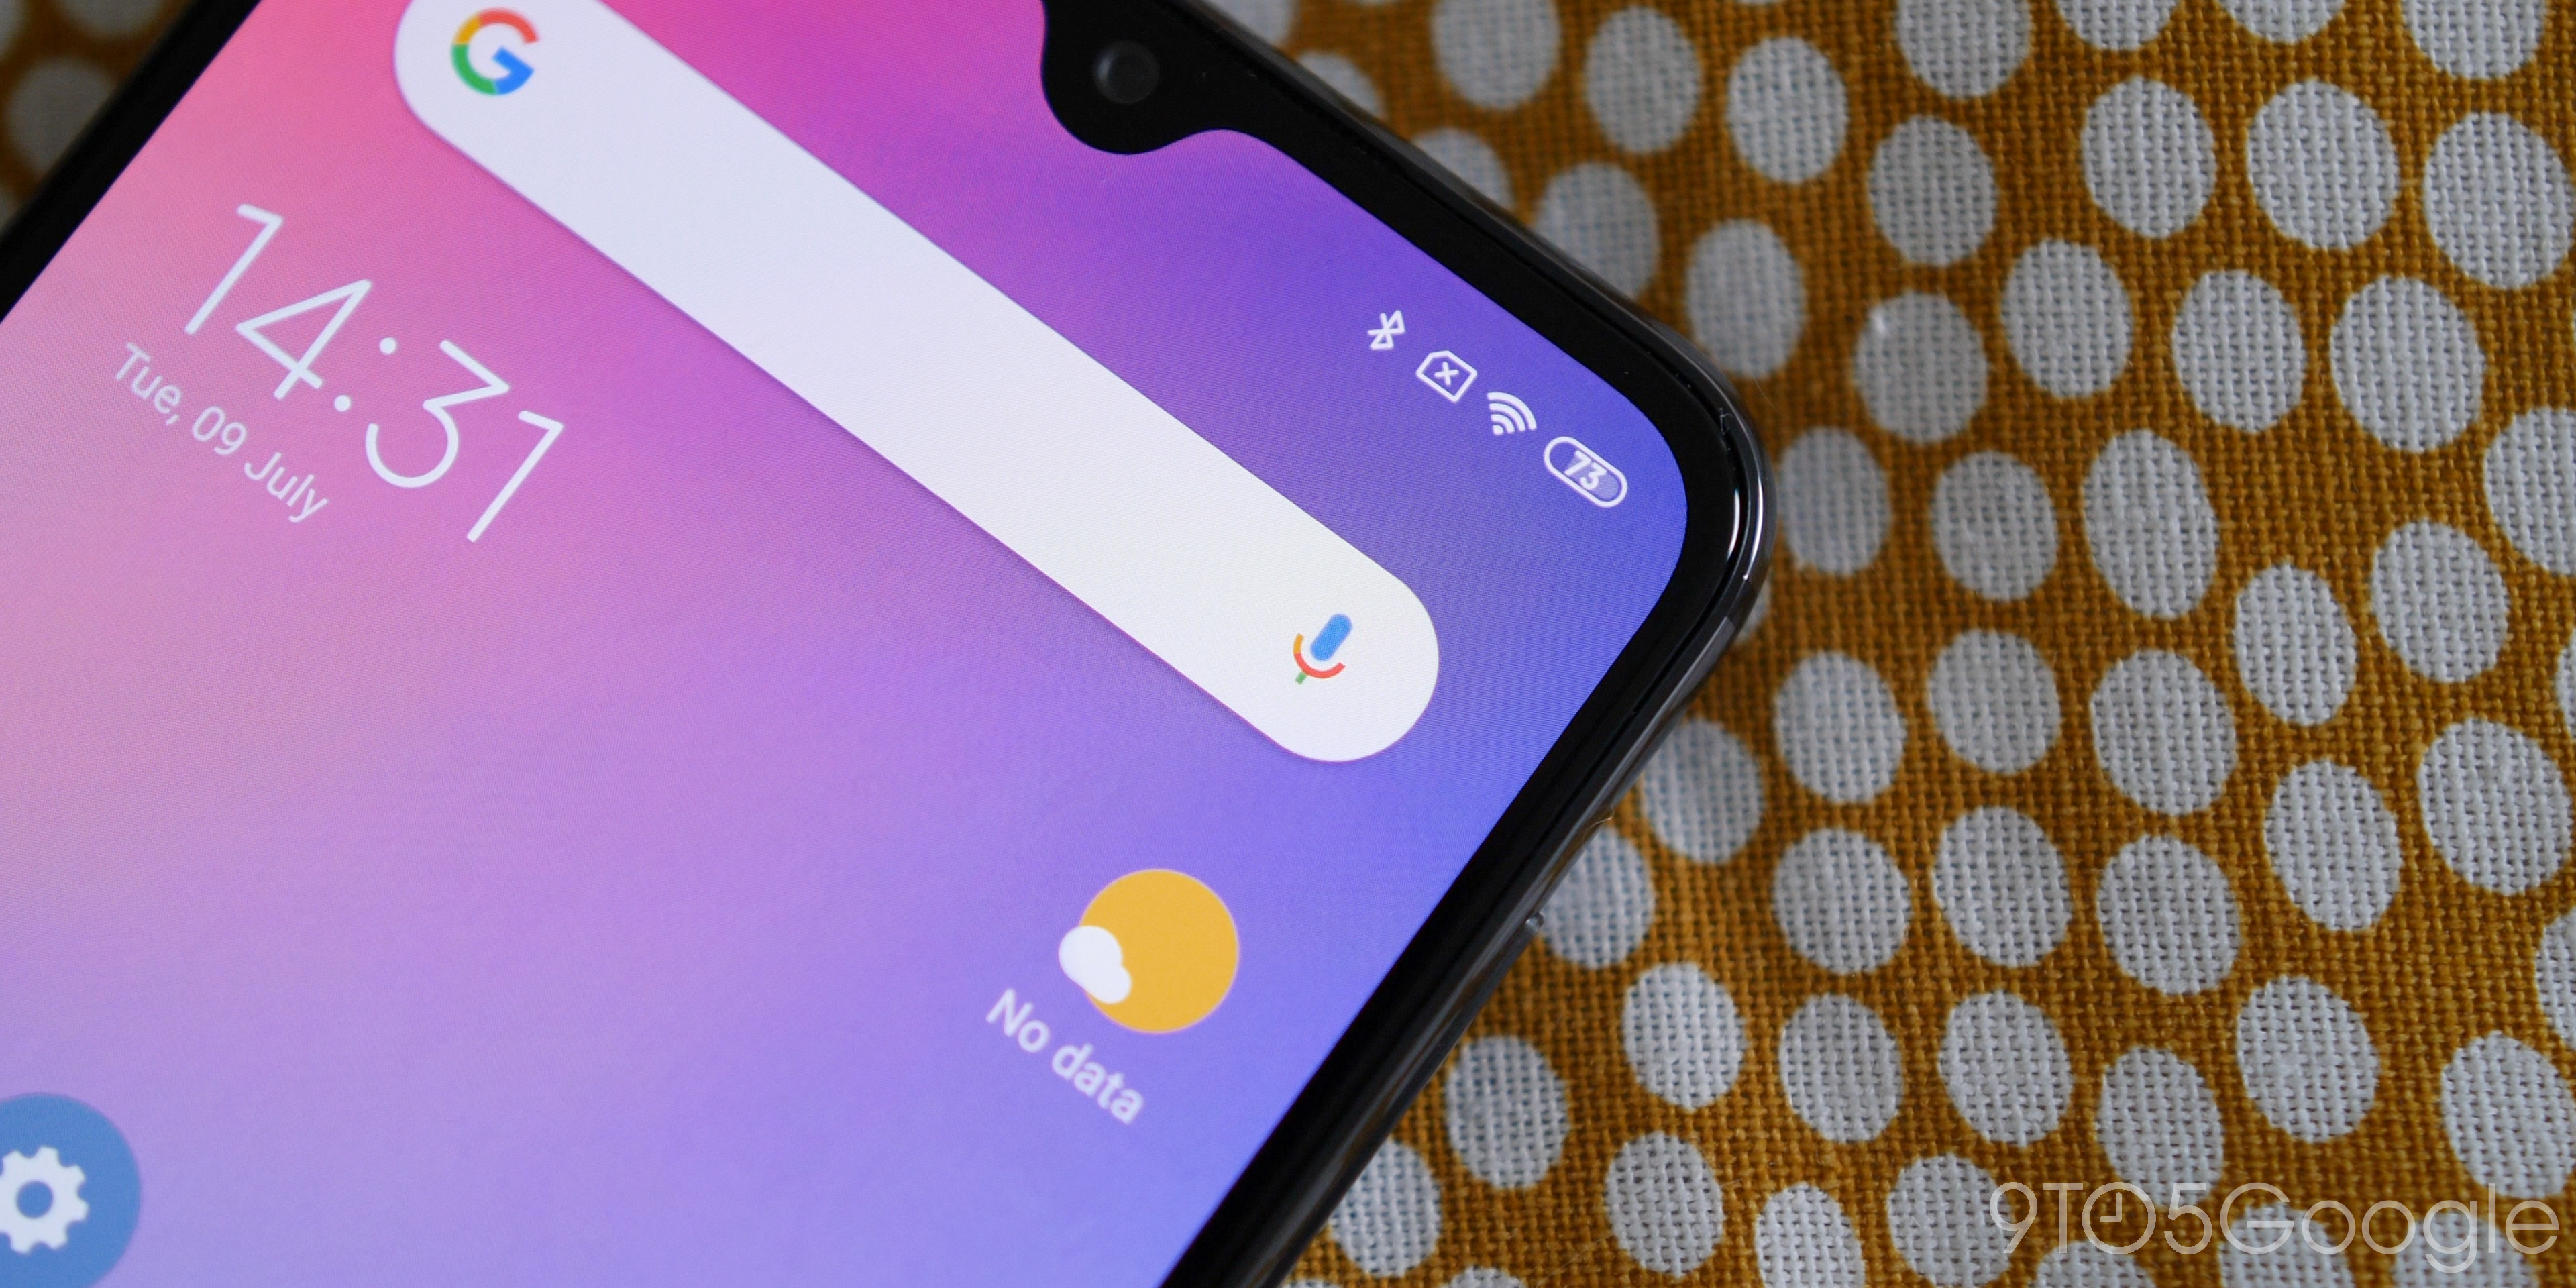 Xiaomi Mi 9 SE review: A real Pixel 3a rival [Video